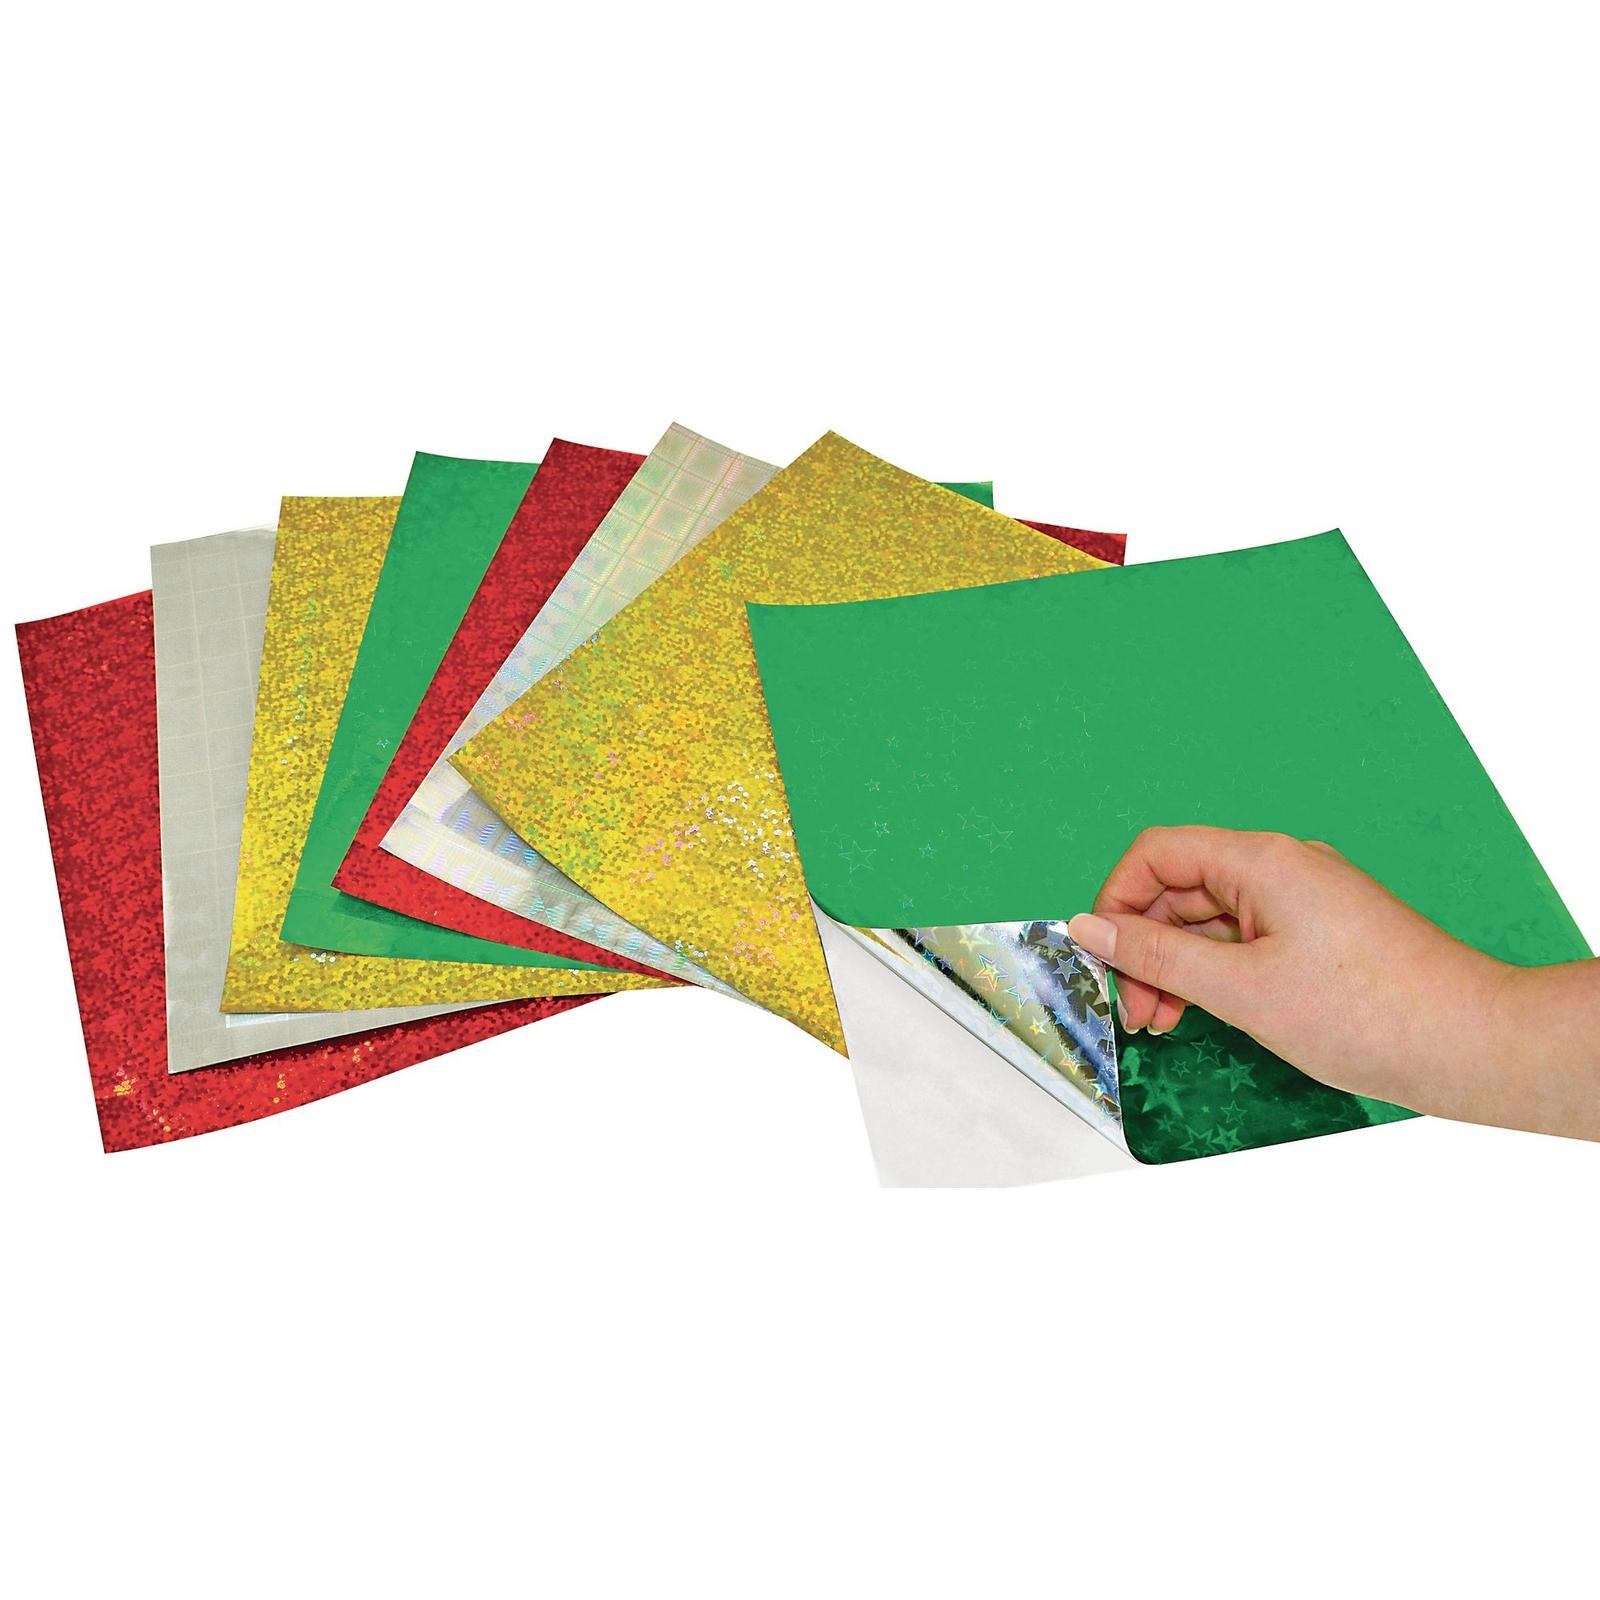 Holographic Self Adhesive Sheets